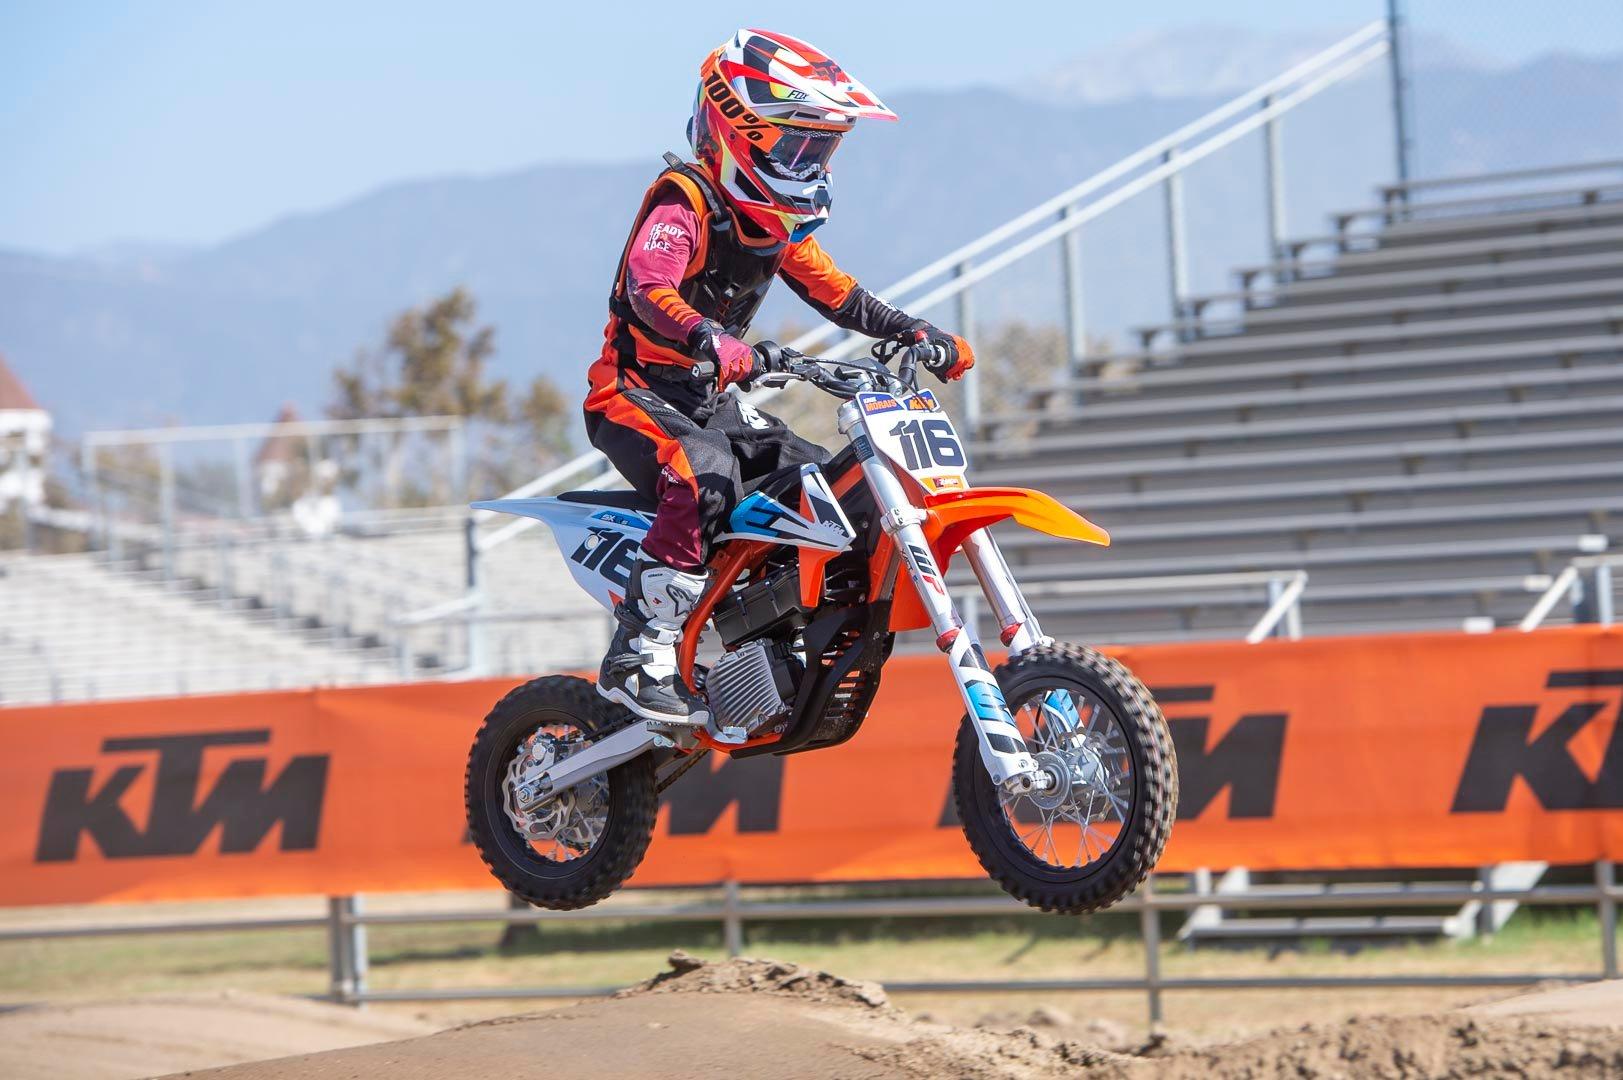 2020 Ktm Sx E 5 Review Electric Mini Motocrosser 15 Fast Facts